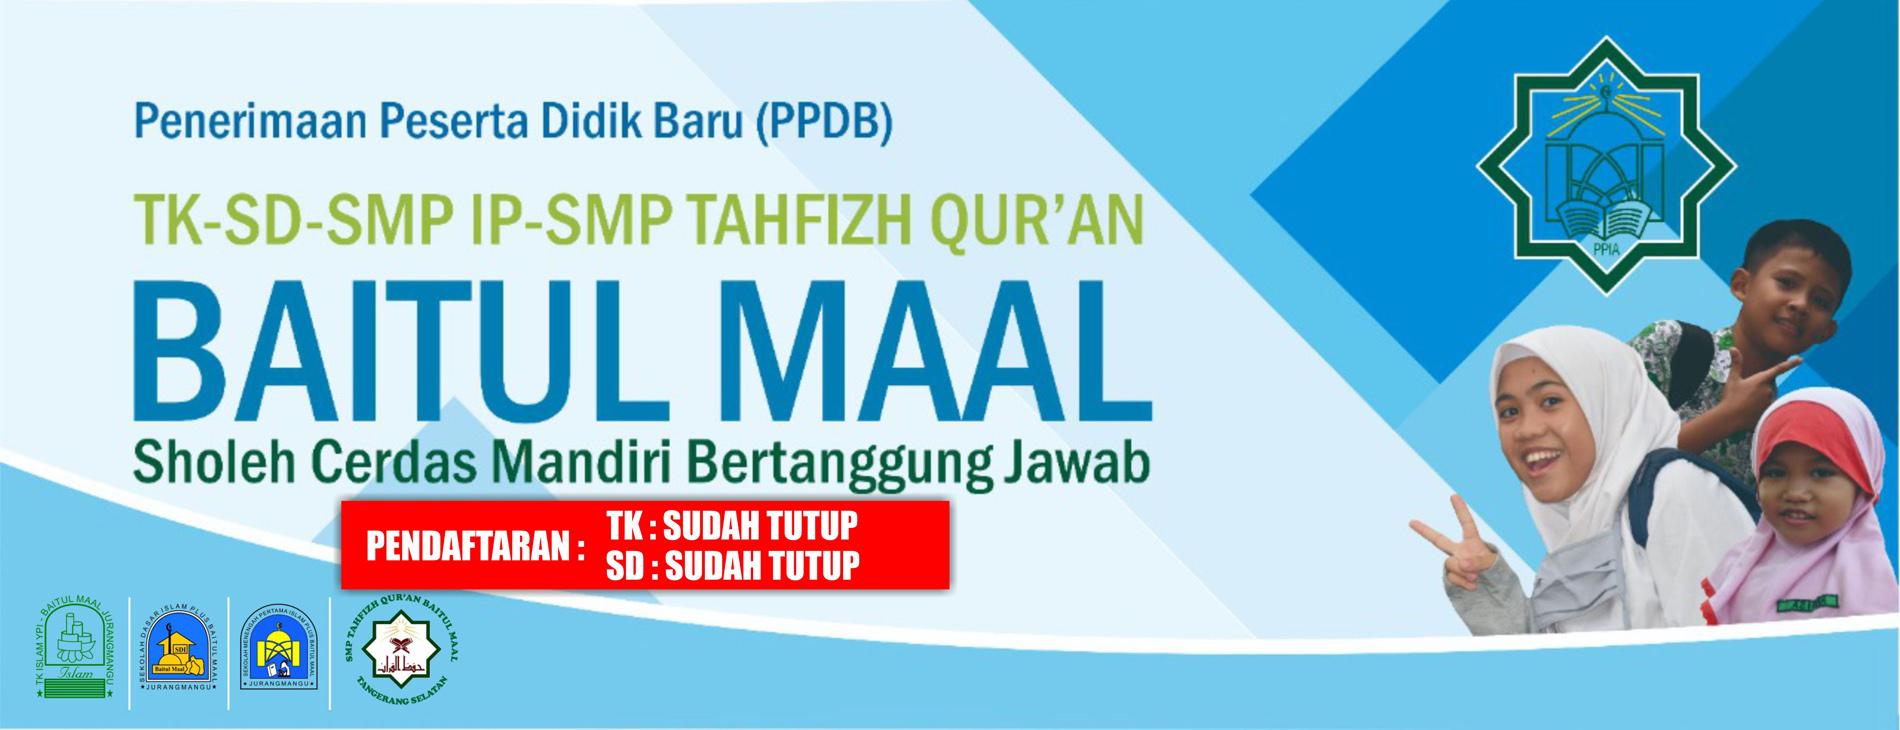 ppdb_2020_4.jpg